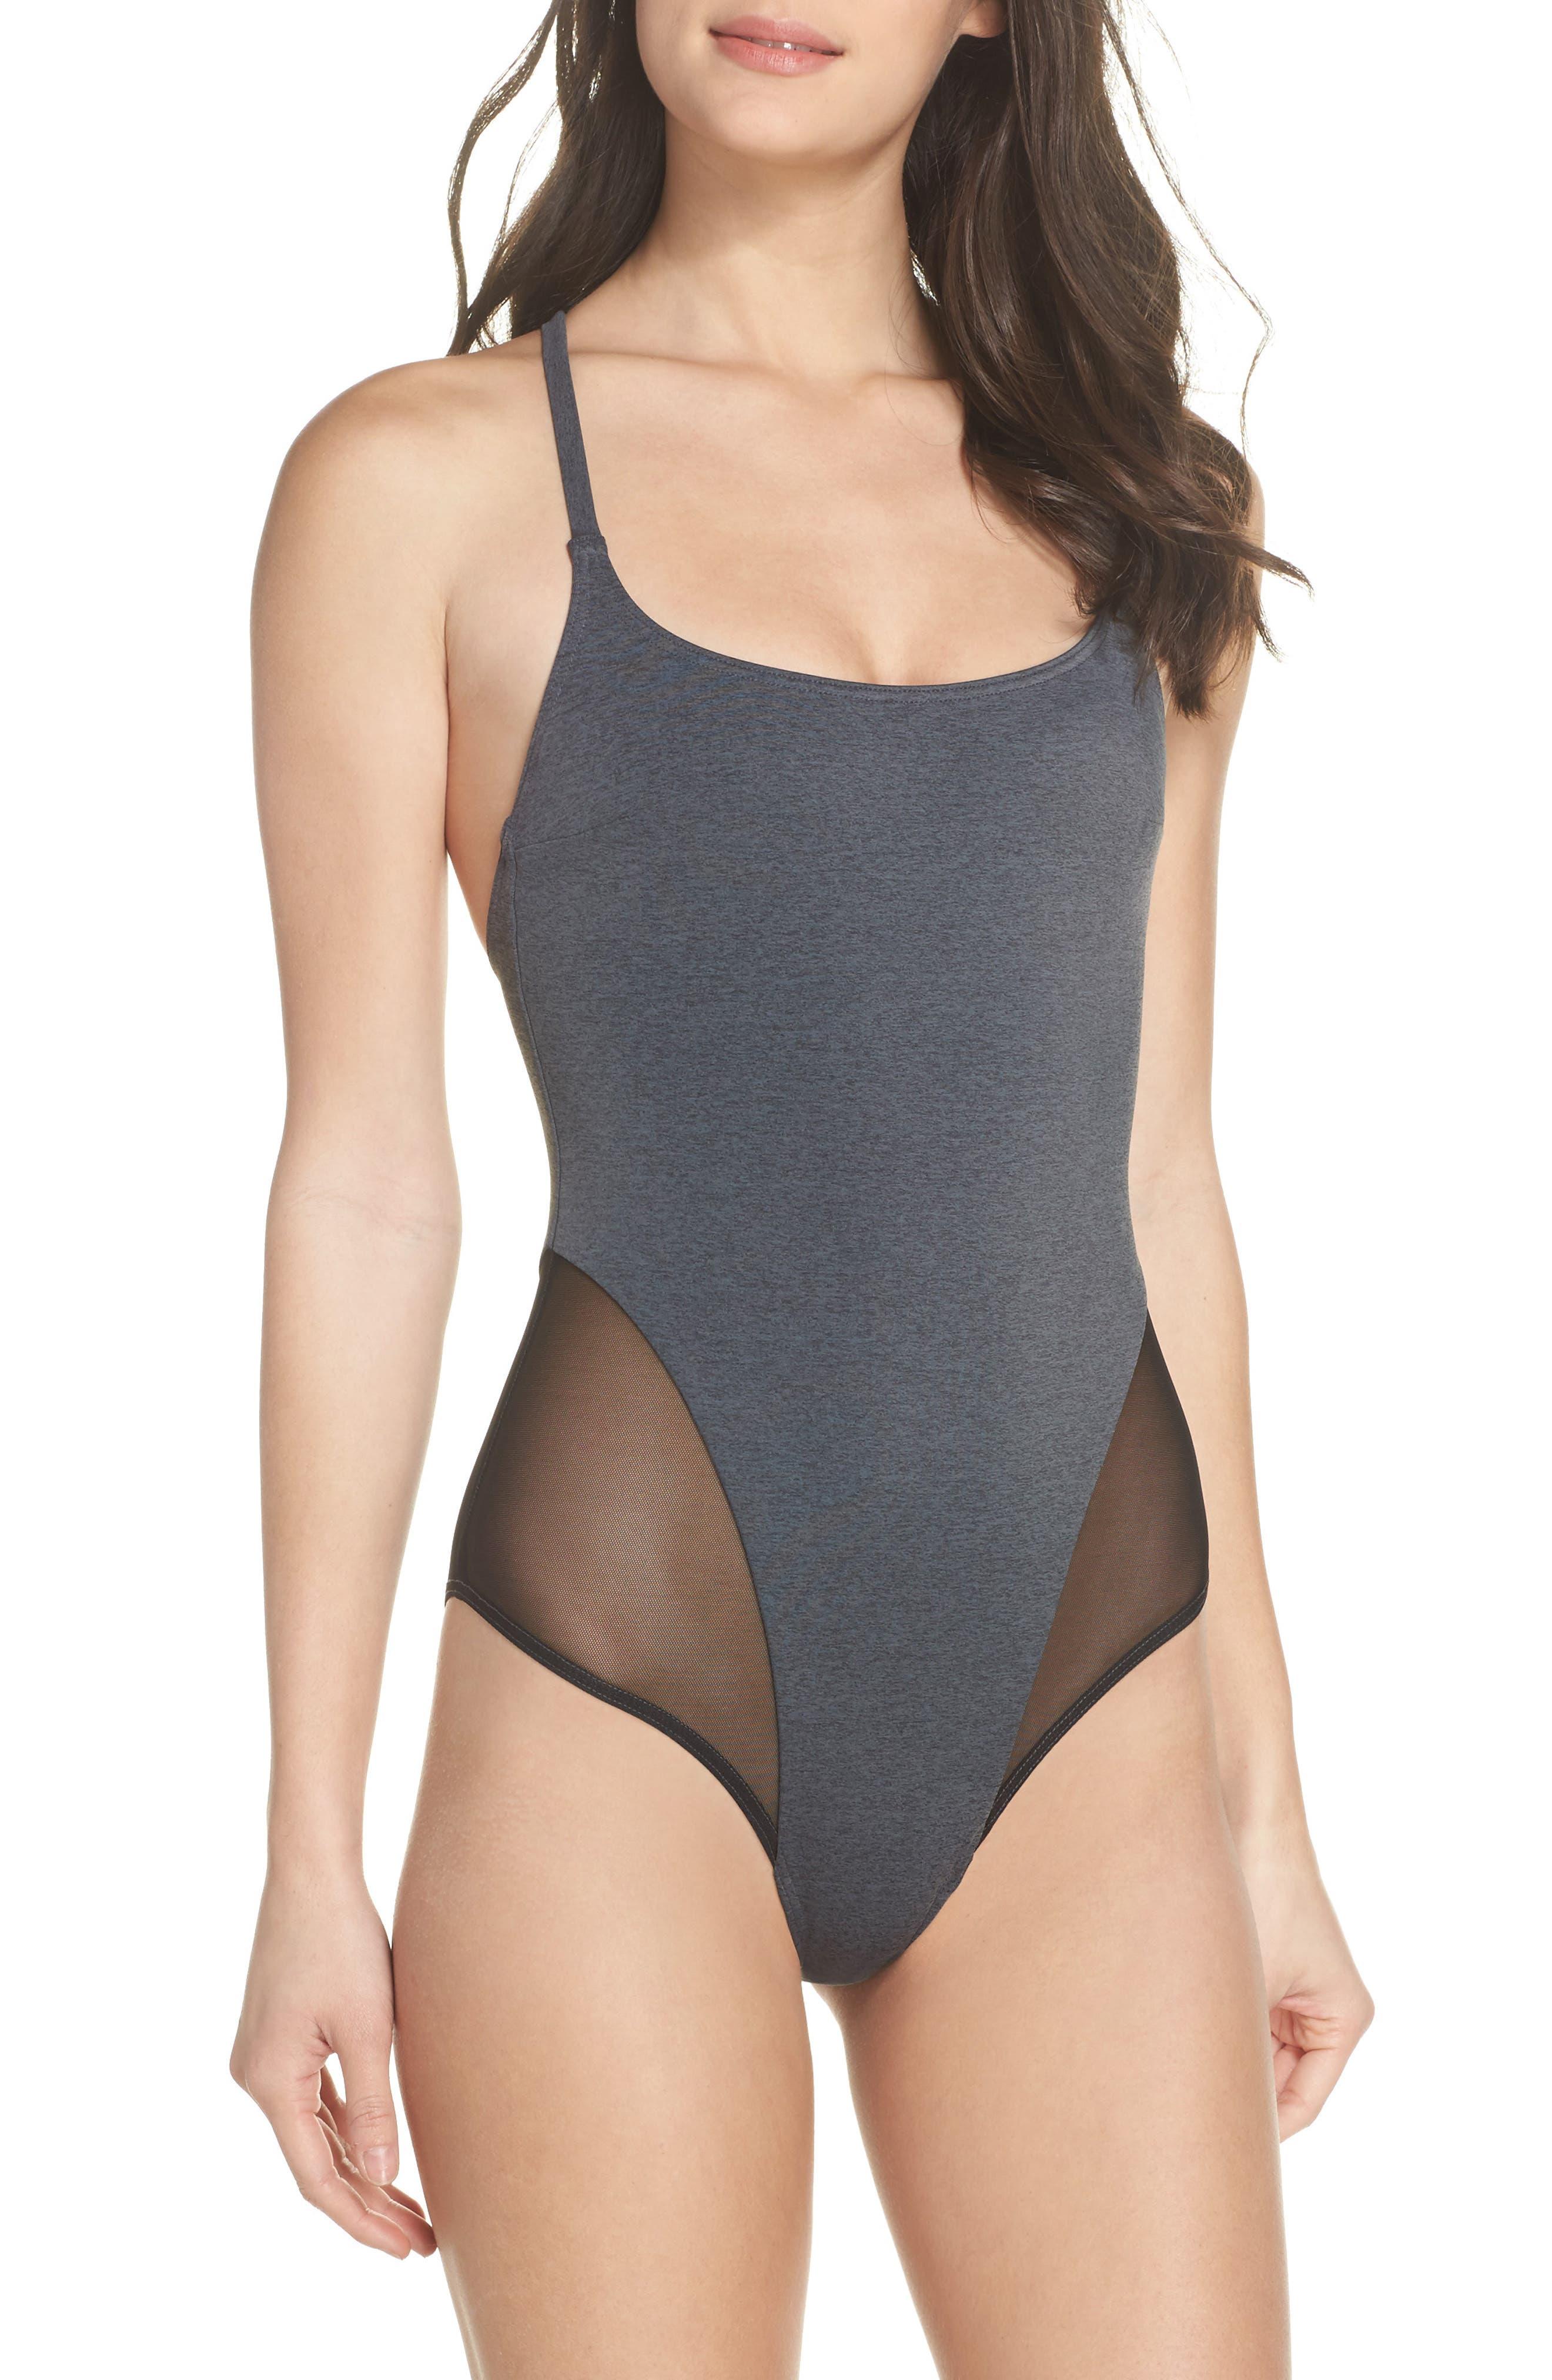 Delta X One-Piece Swimsuit,                         Main,                         color, 020